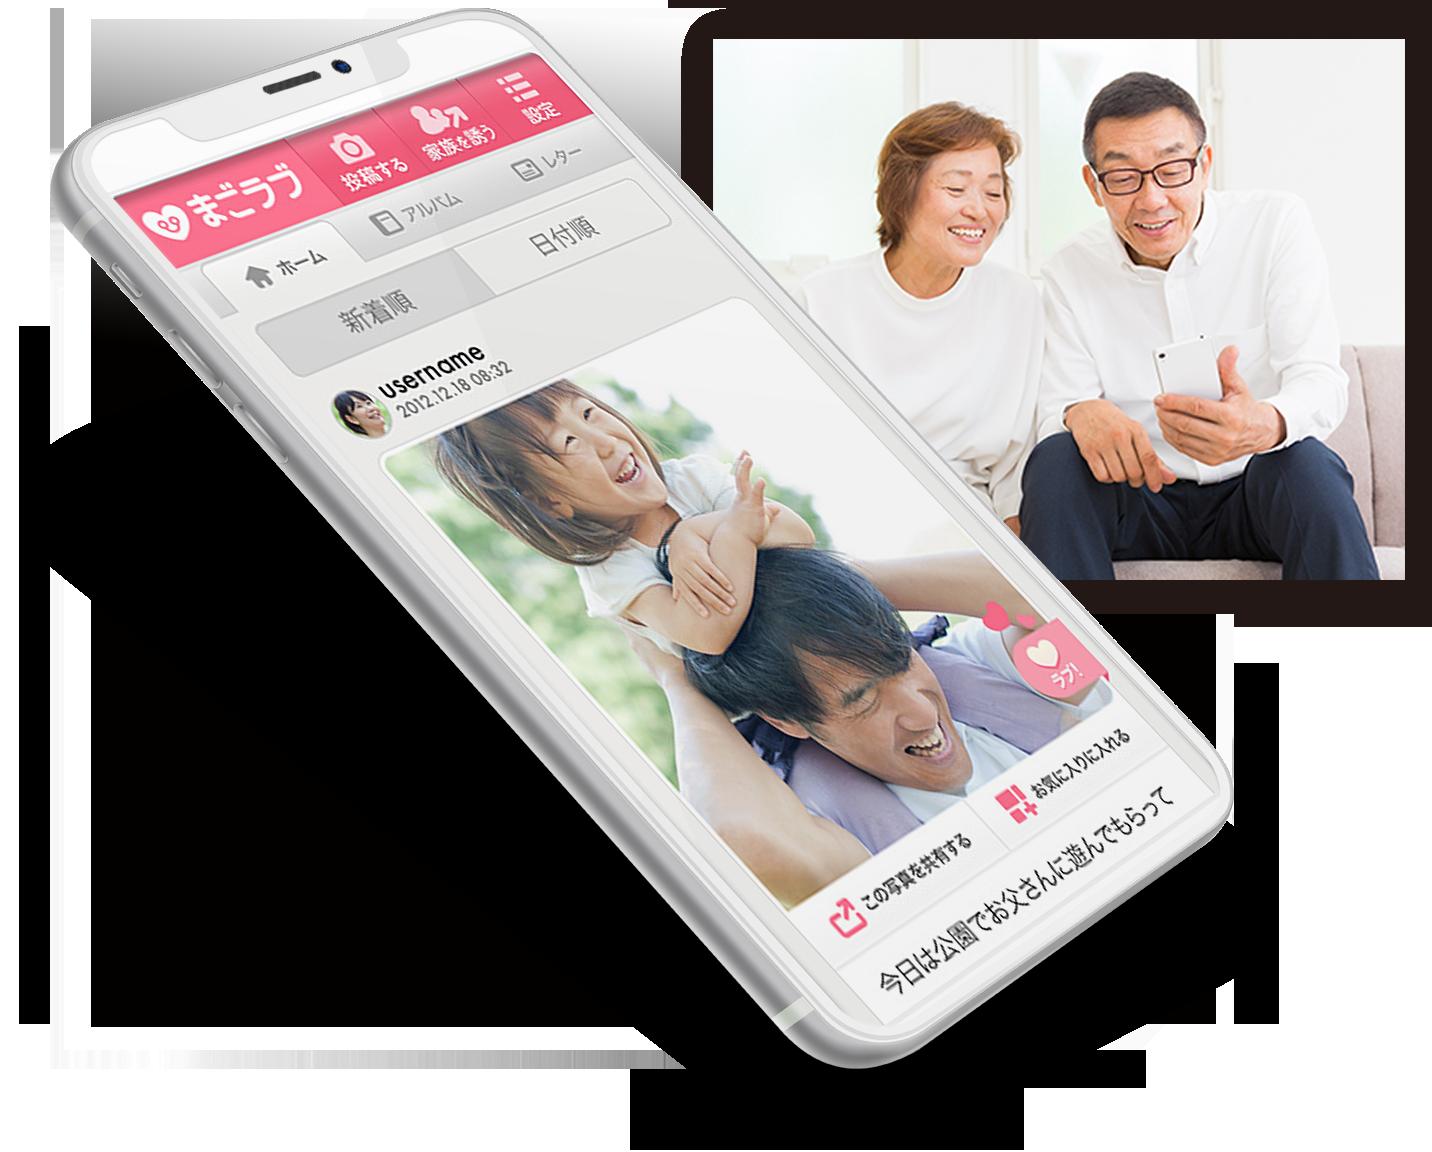 子育て写真・動画の共有アプリ